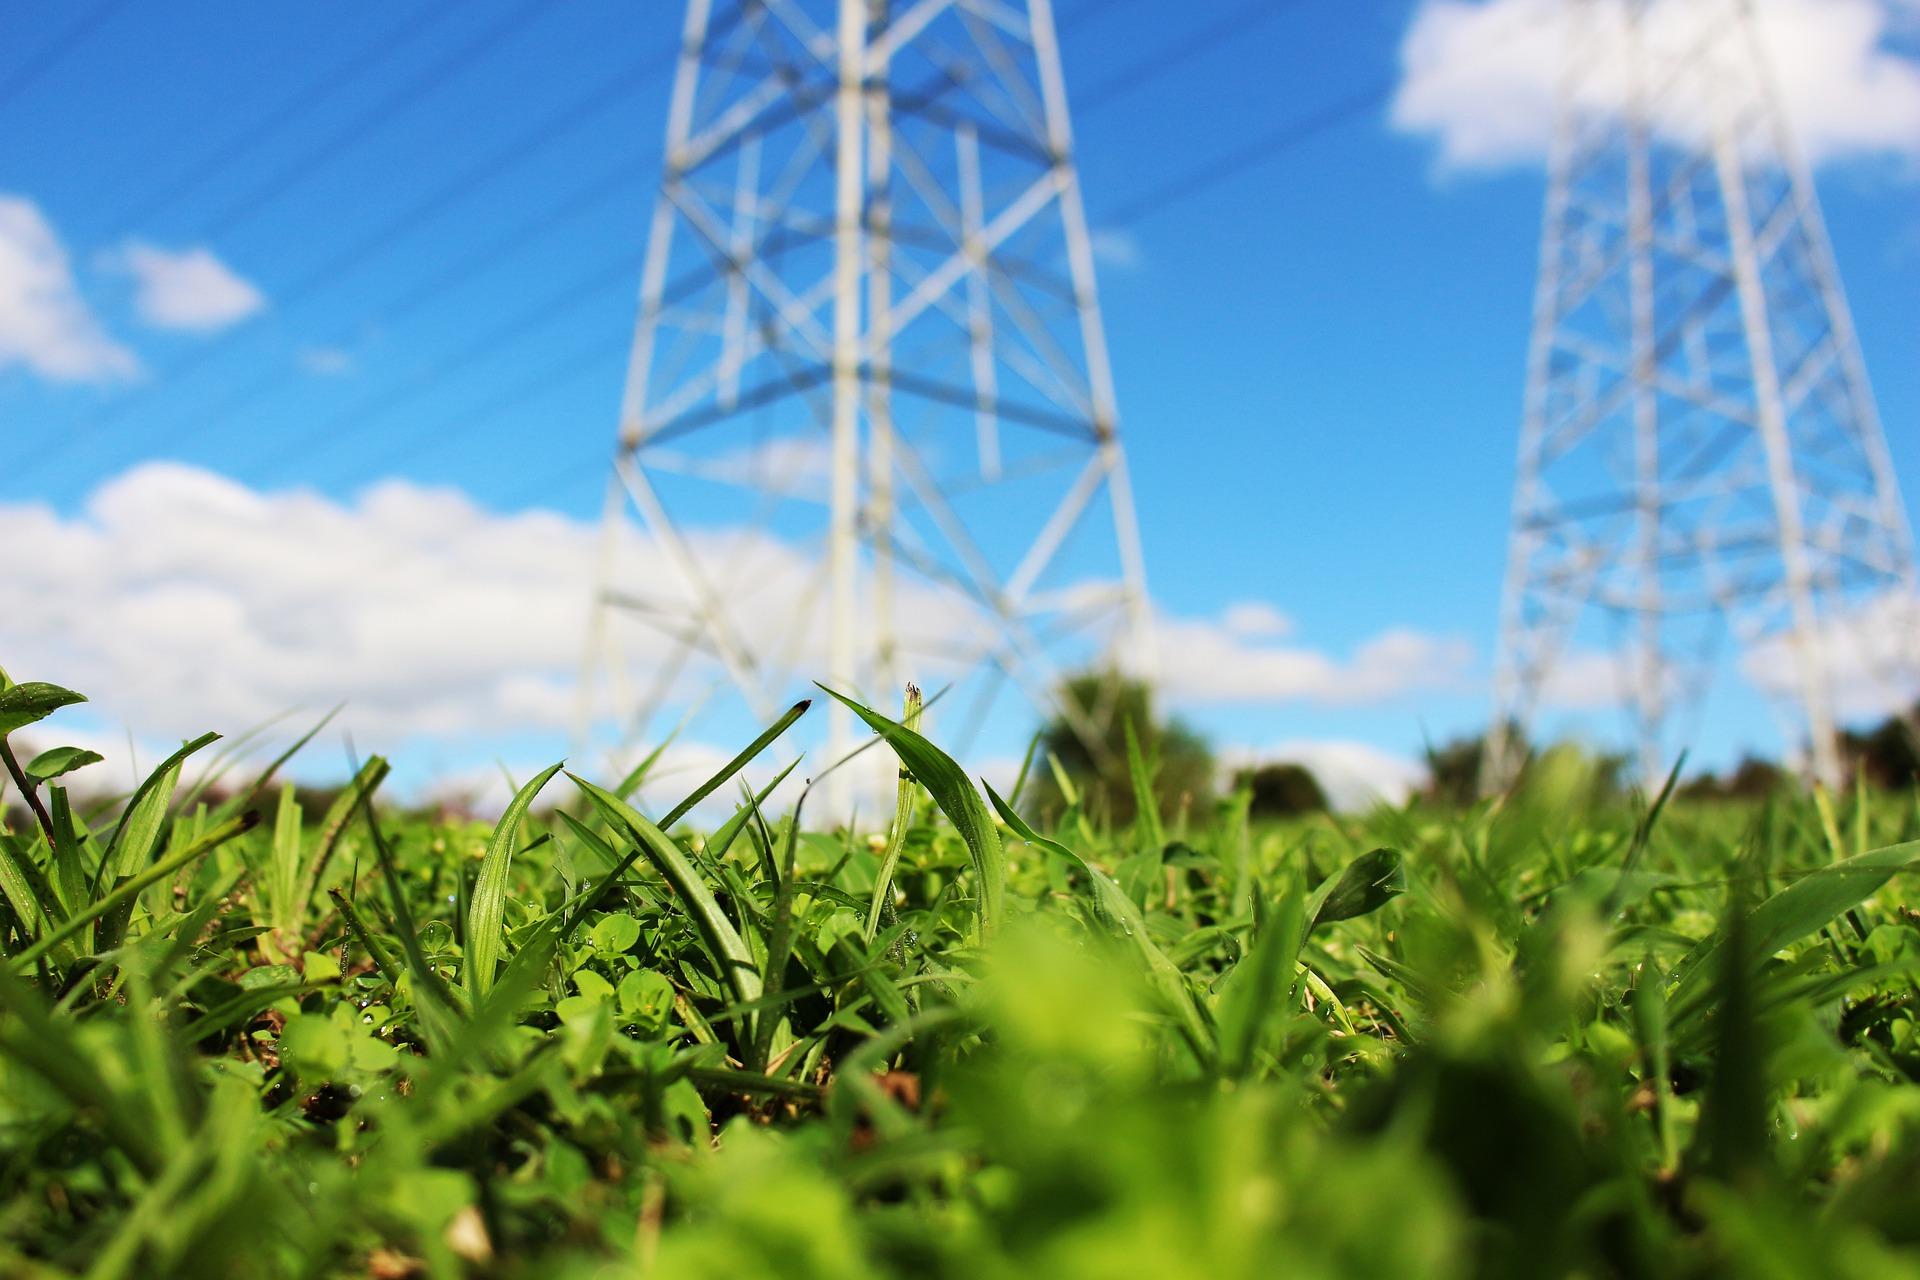 palestra-variabilidade-climatica-e-impactos-no-sistema-electroprodutor-europeu-projeto-clim2power